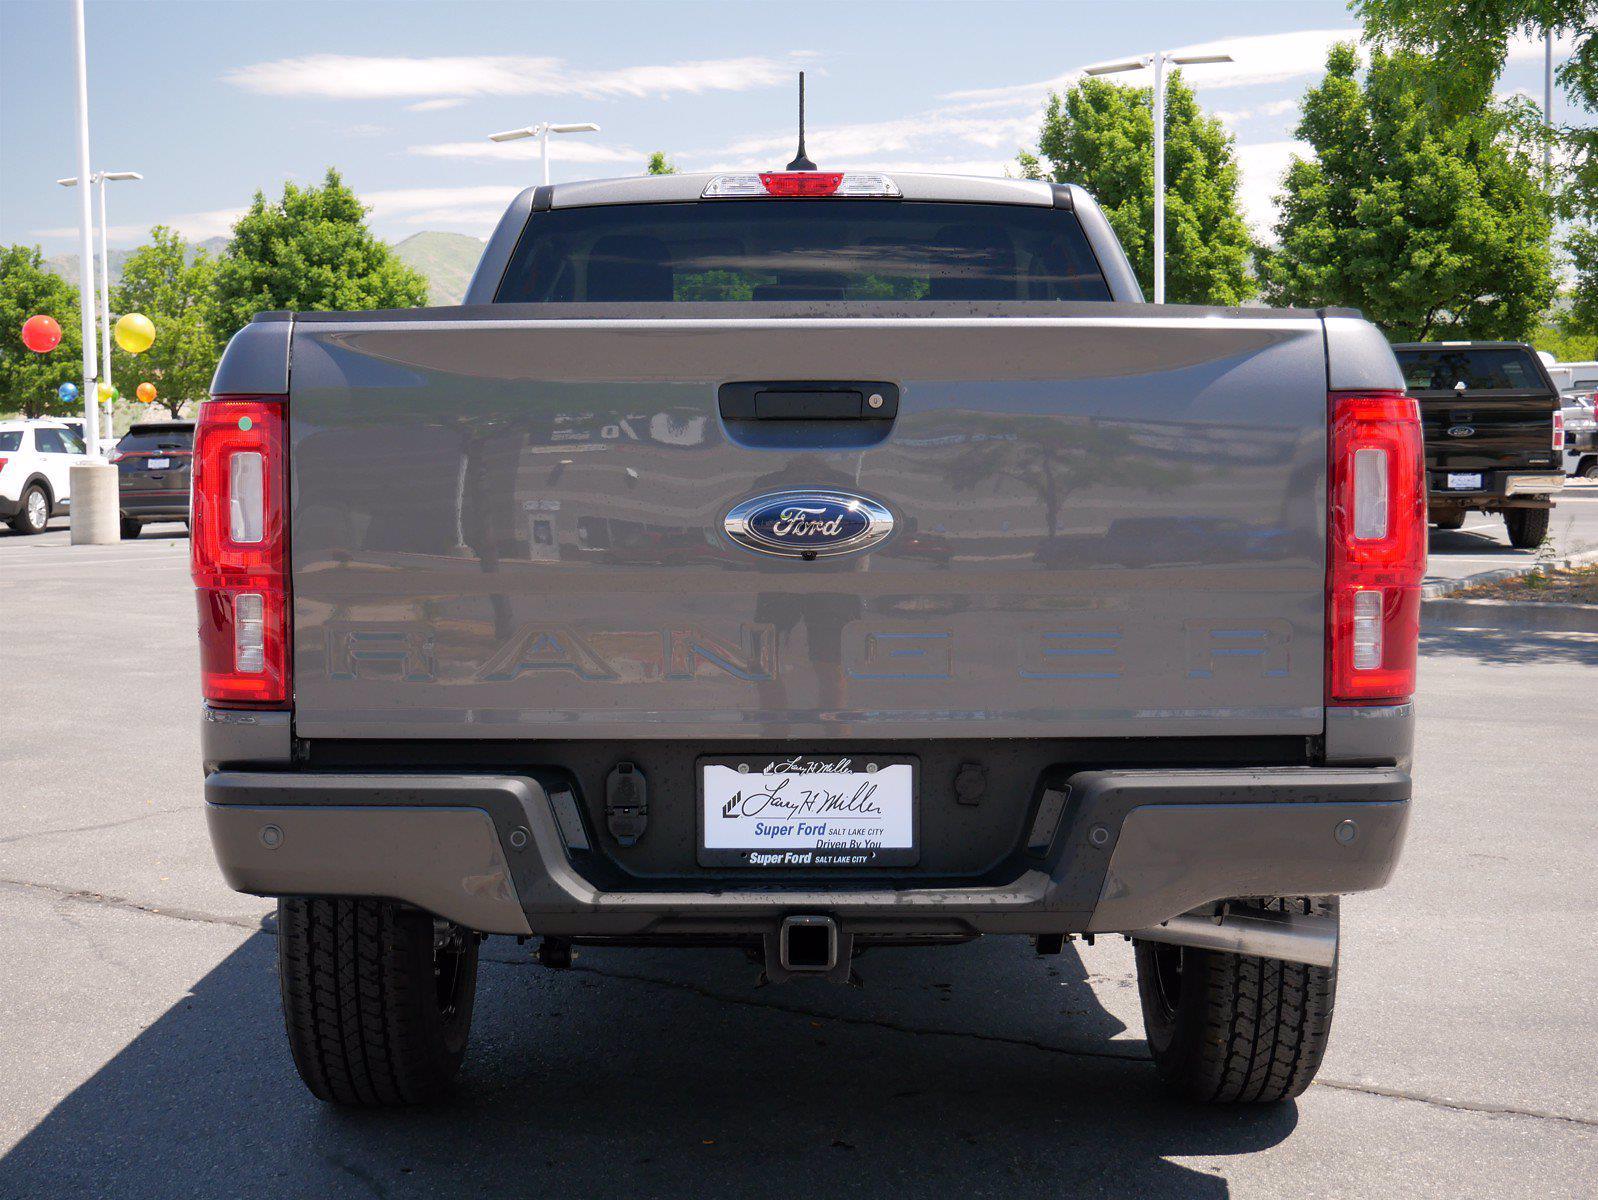 2021 Ford Ranger Super Cab 4x4, Pickup #24495 - photo 6